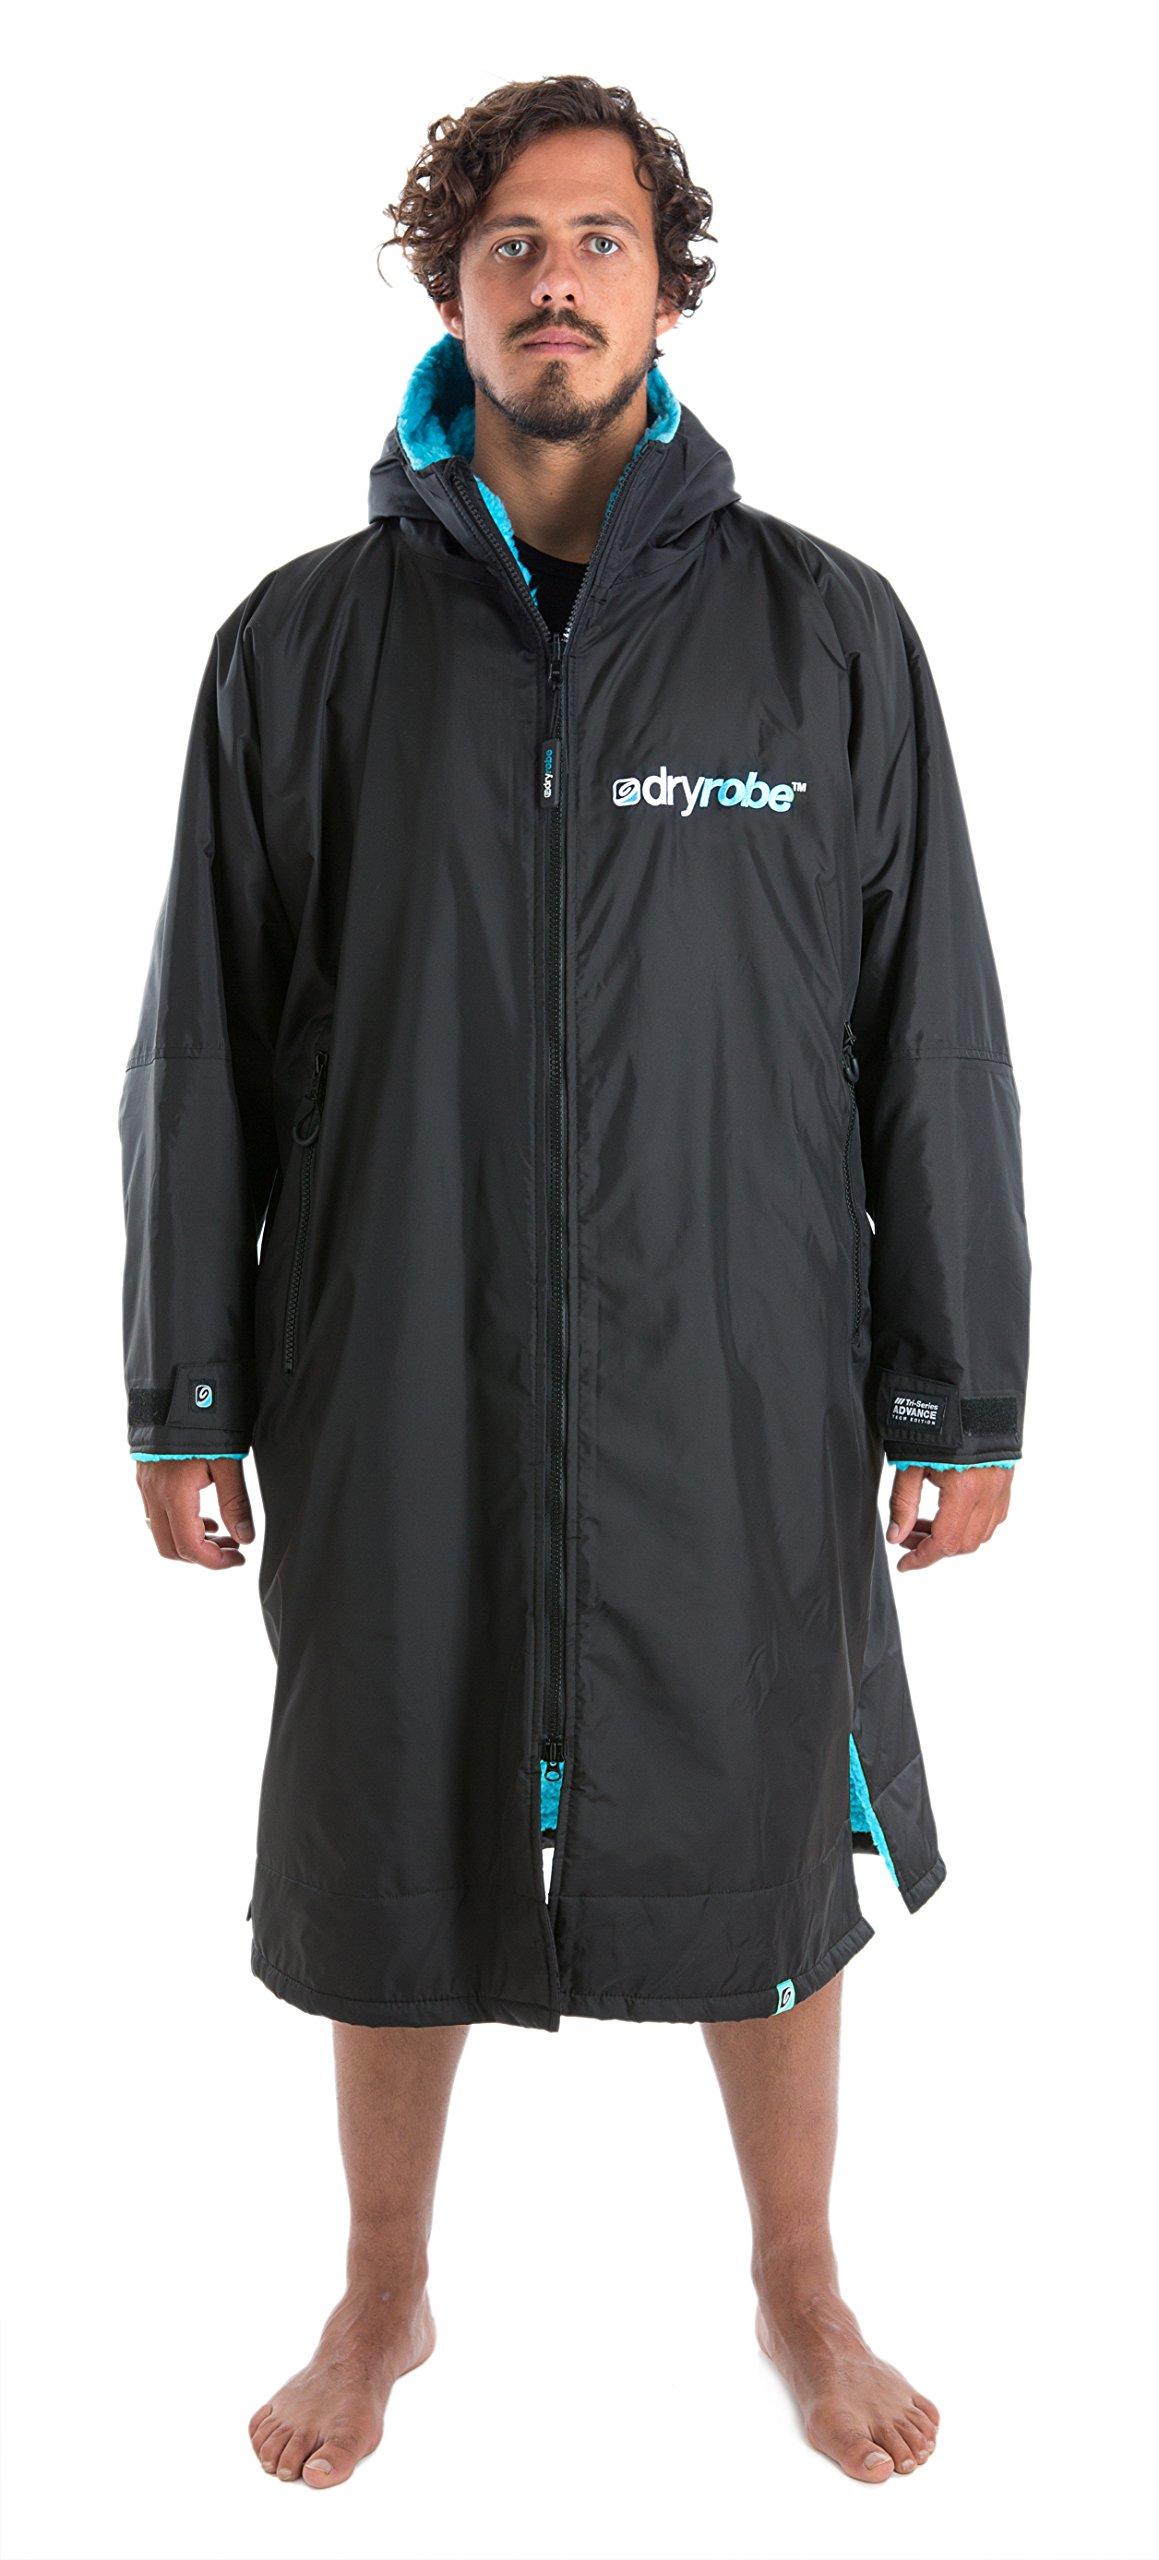 Dryrobe Advance Adult Changing Robe - Long Sleeve Change Poncho / Dry Robe Large Black / Blue